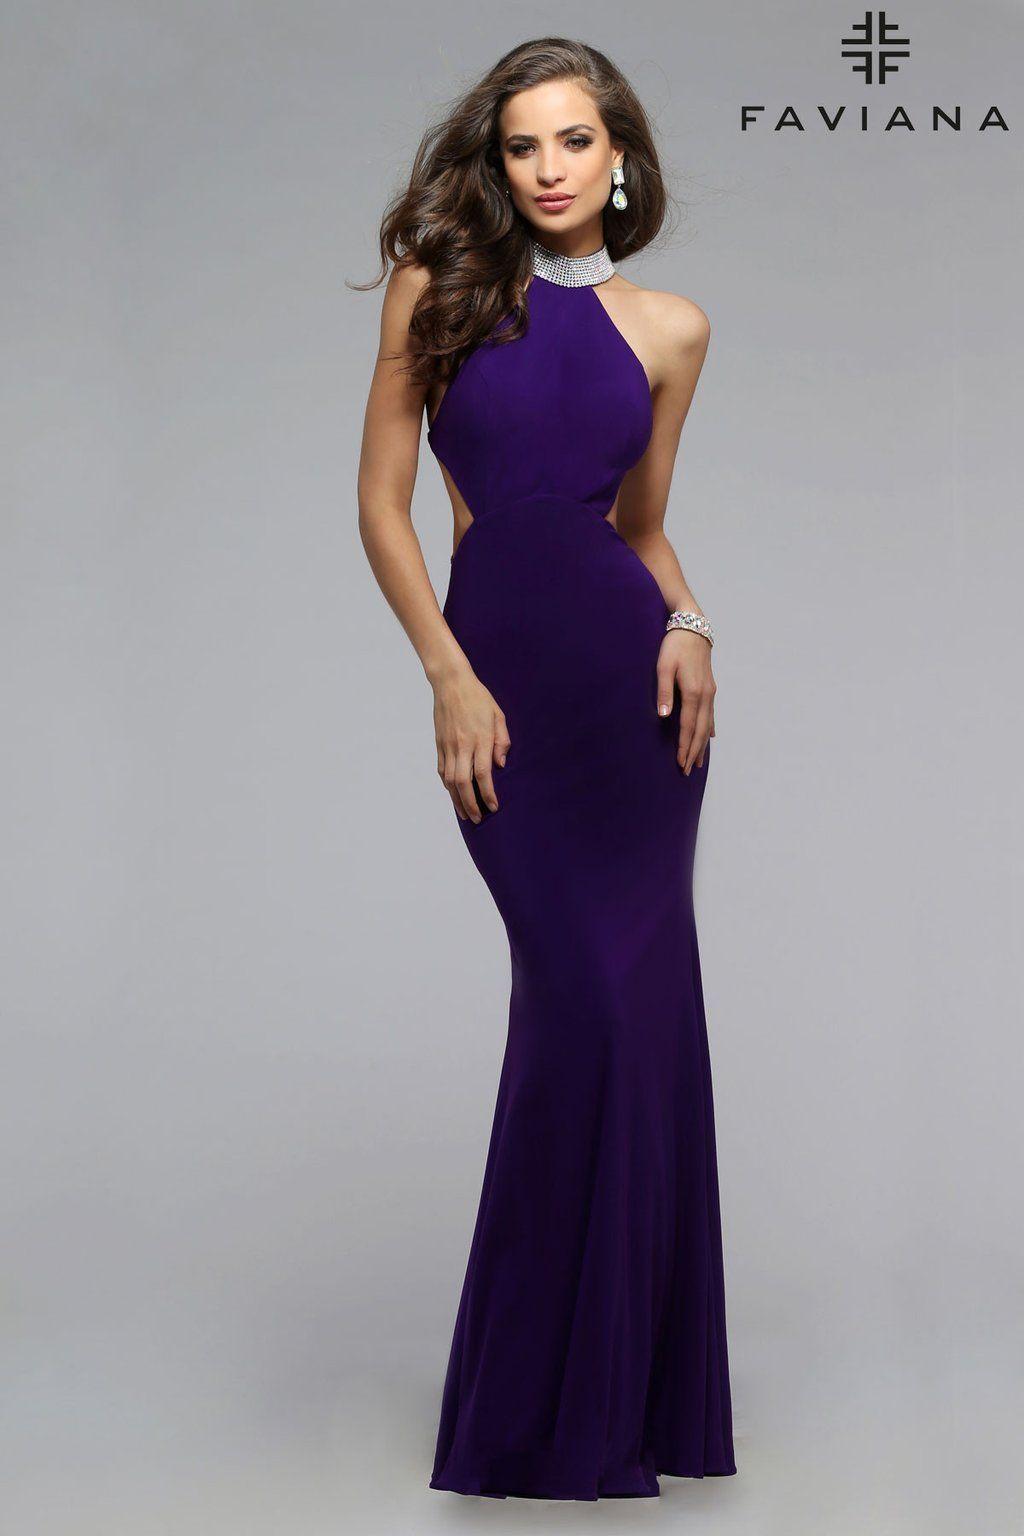 Faviana faviana prom dresses pinterest red carpet